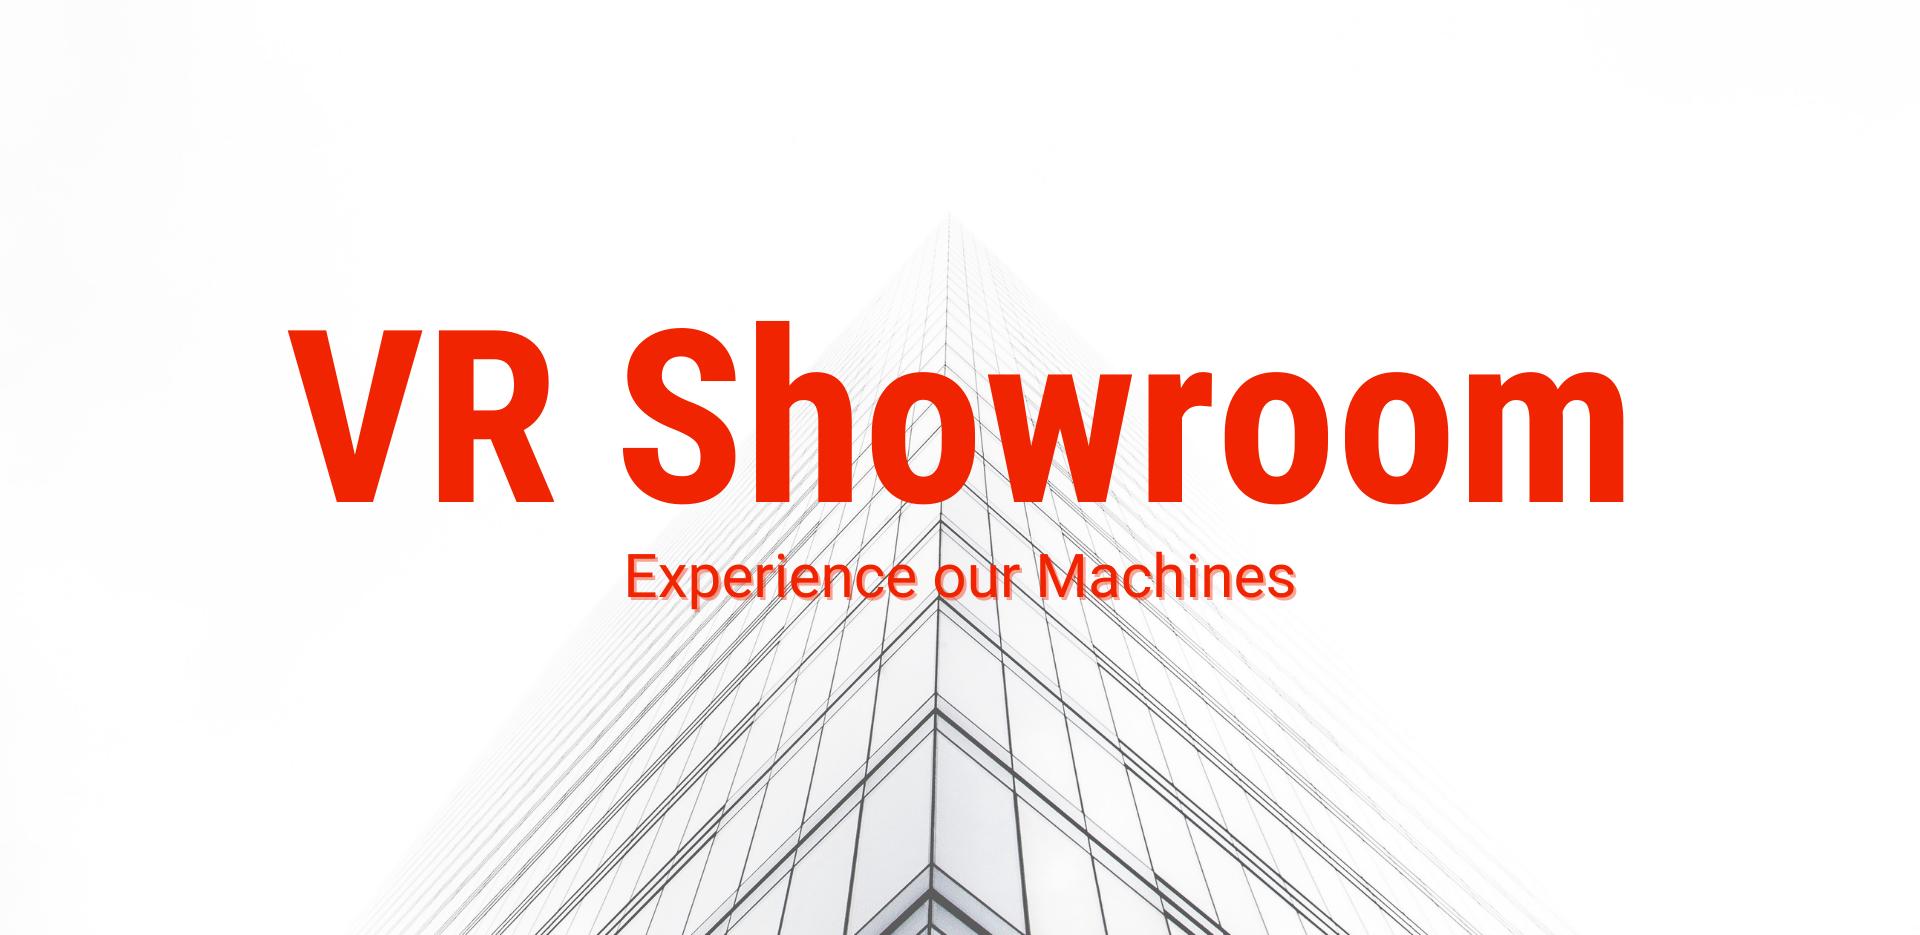 VR Shrowroom